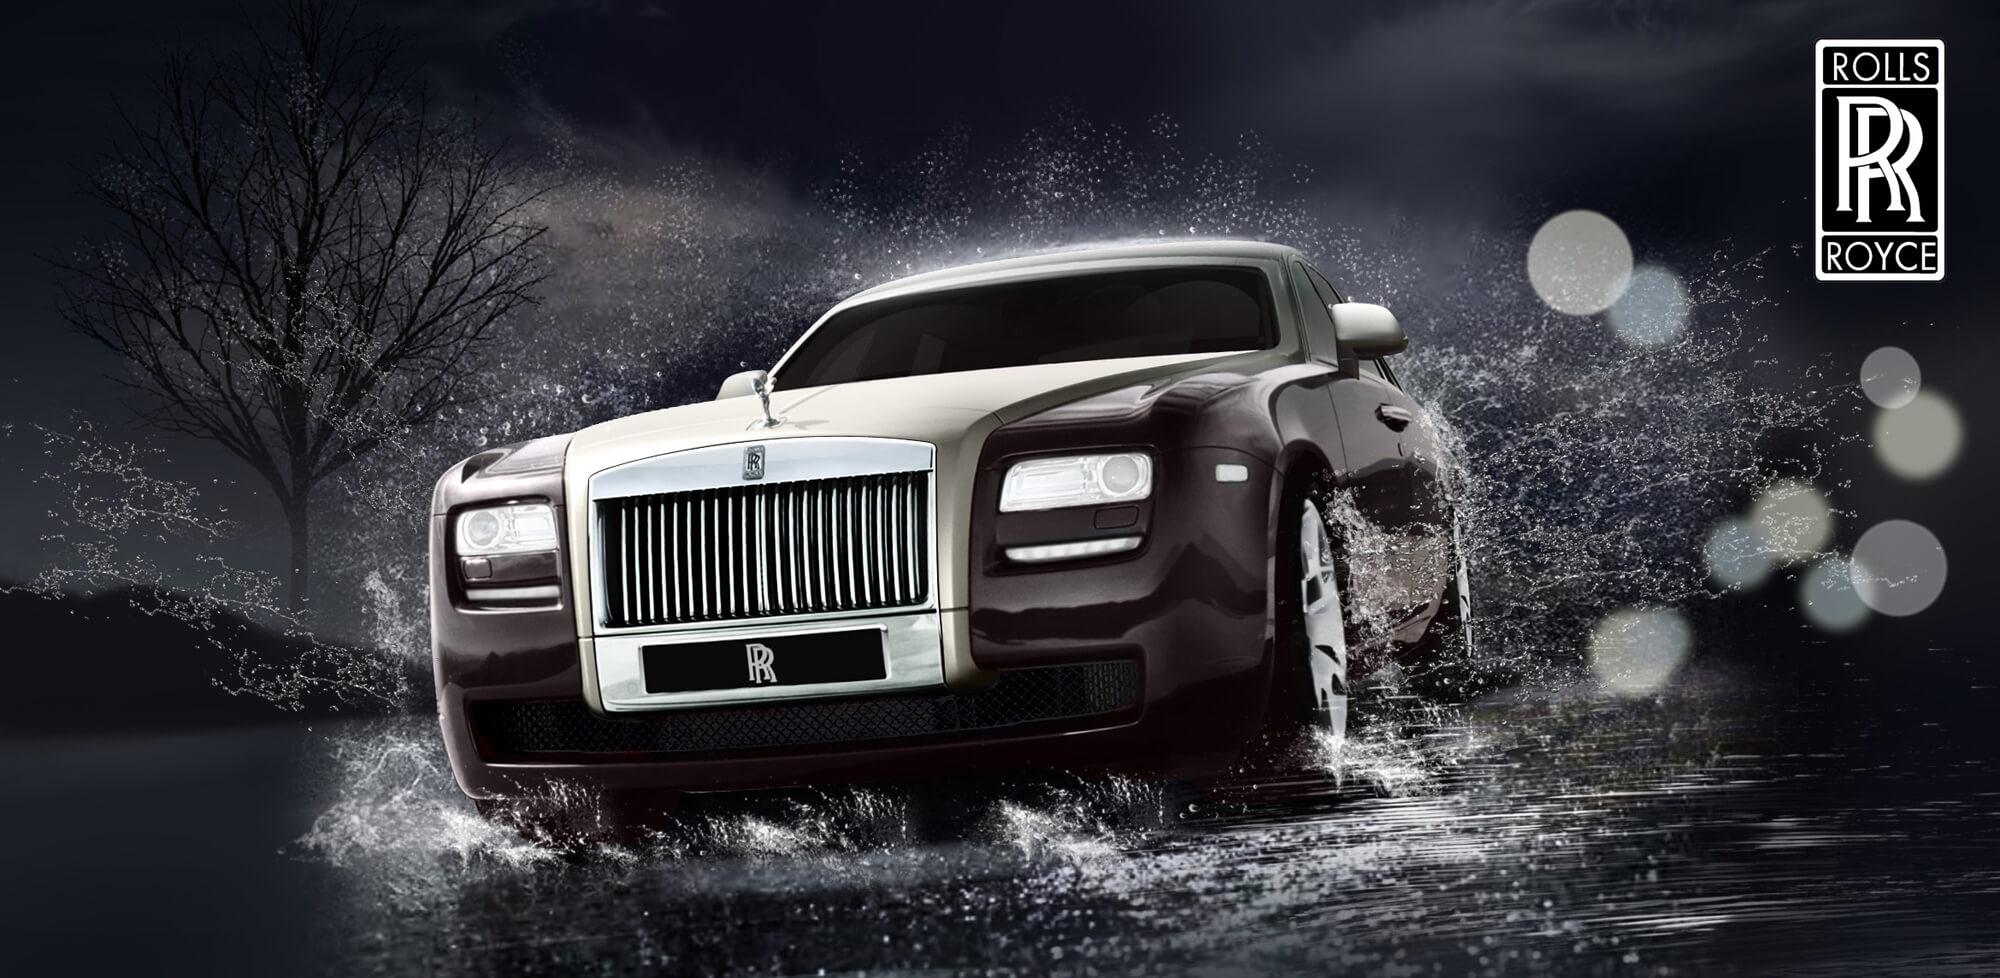 Rolls_Royce_Print_Ads_1.jpg